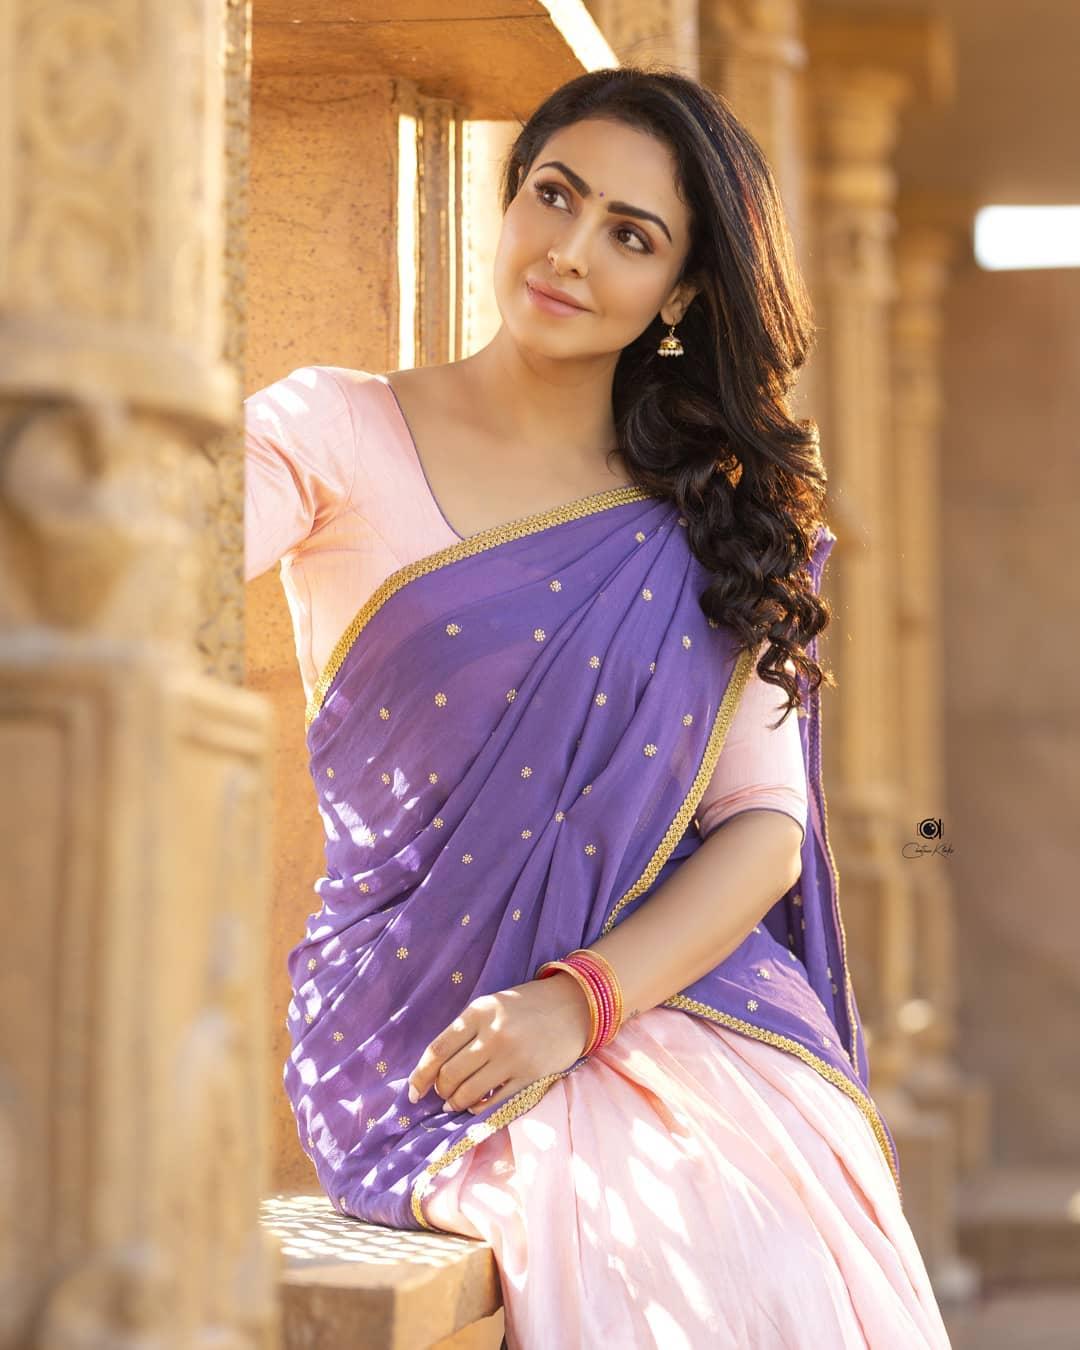 Nandini rai latest images